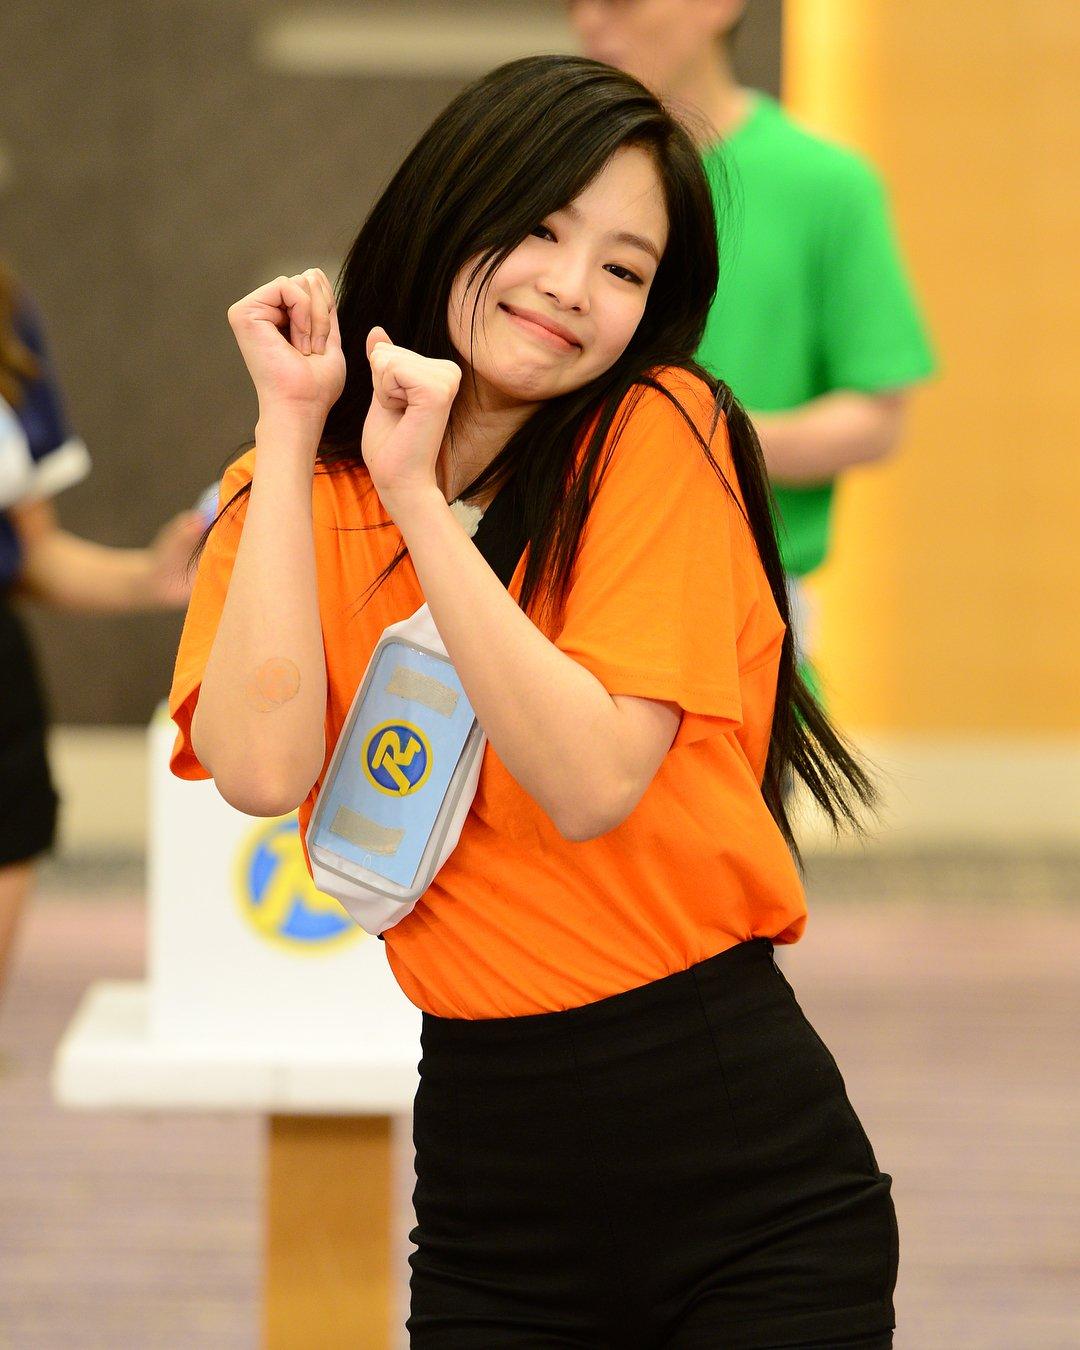 blackpinkrainbow_orange_jennie